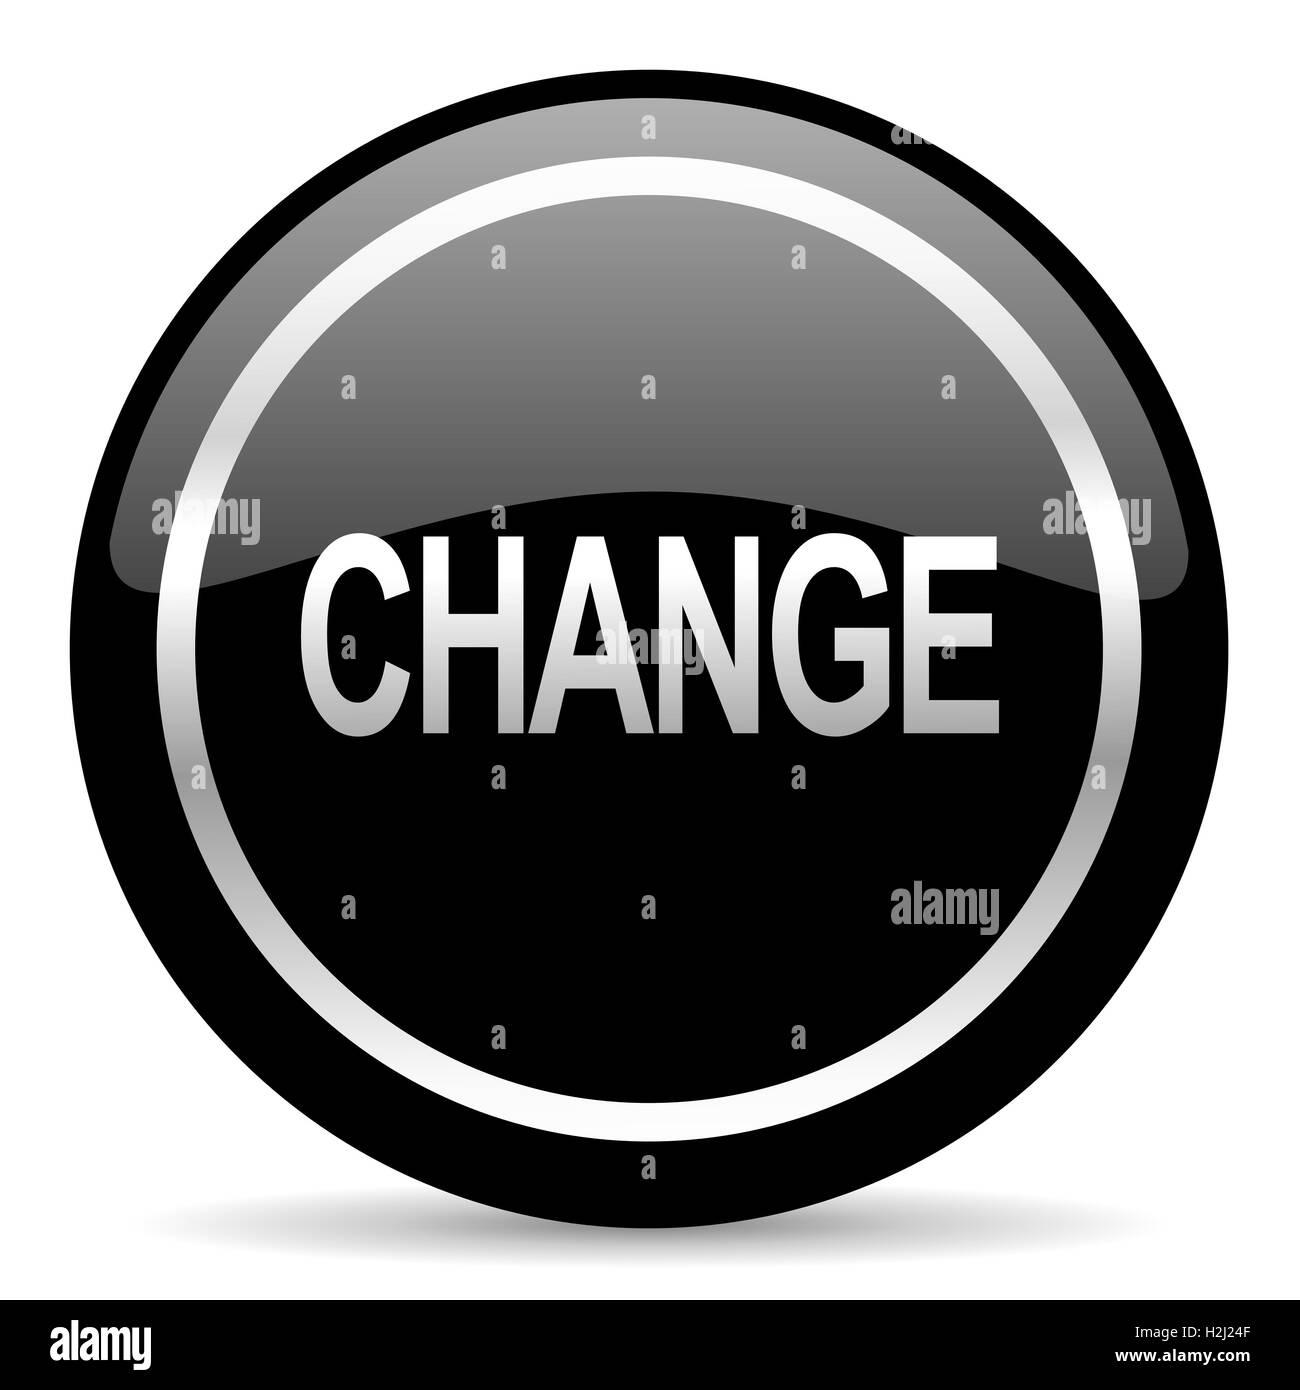 improvement icon black and white stock photos images alamy